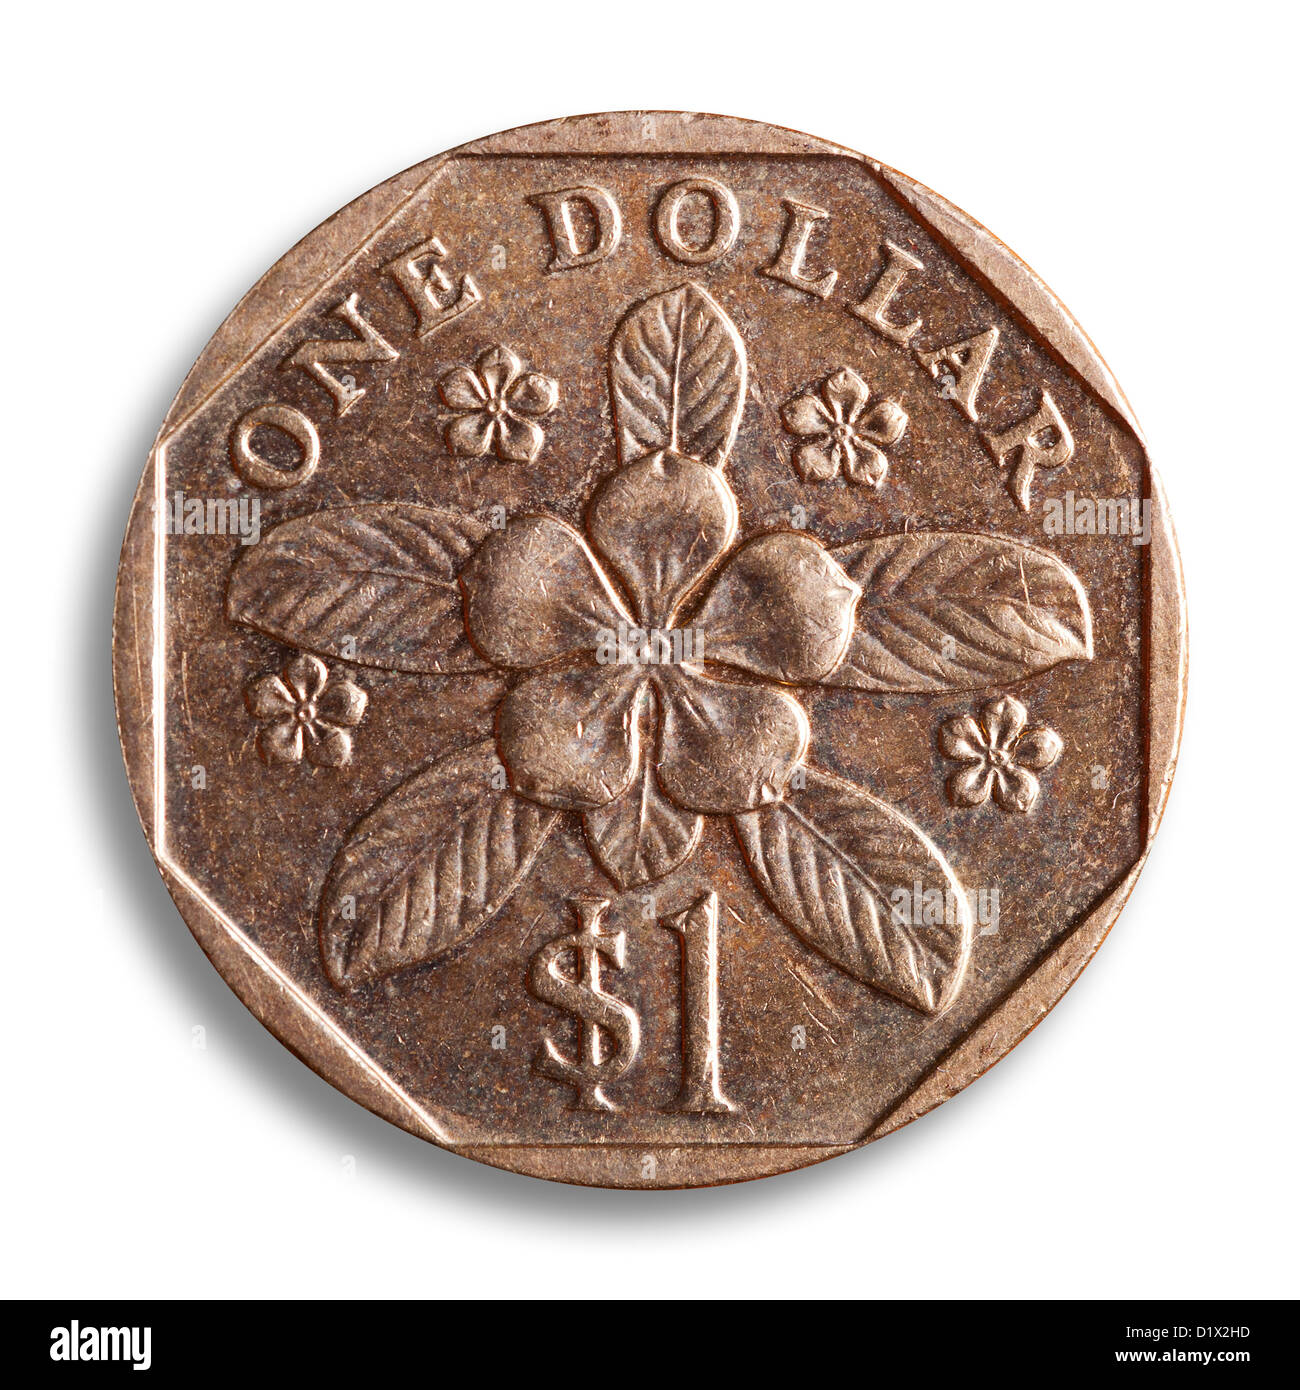 Singapur Dollar Münze Weiße Backgroudn Clipping Pfad Stockfoto